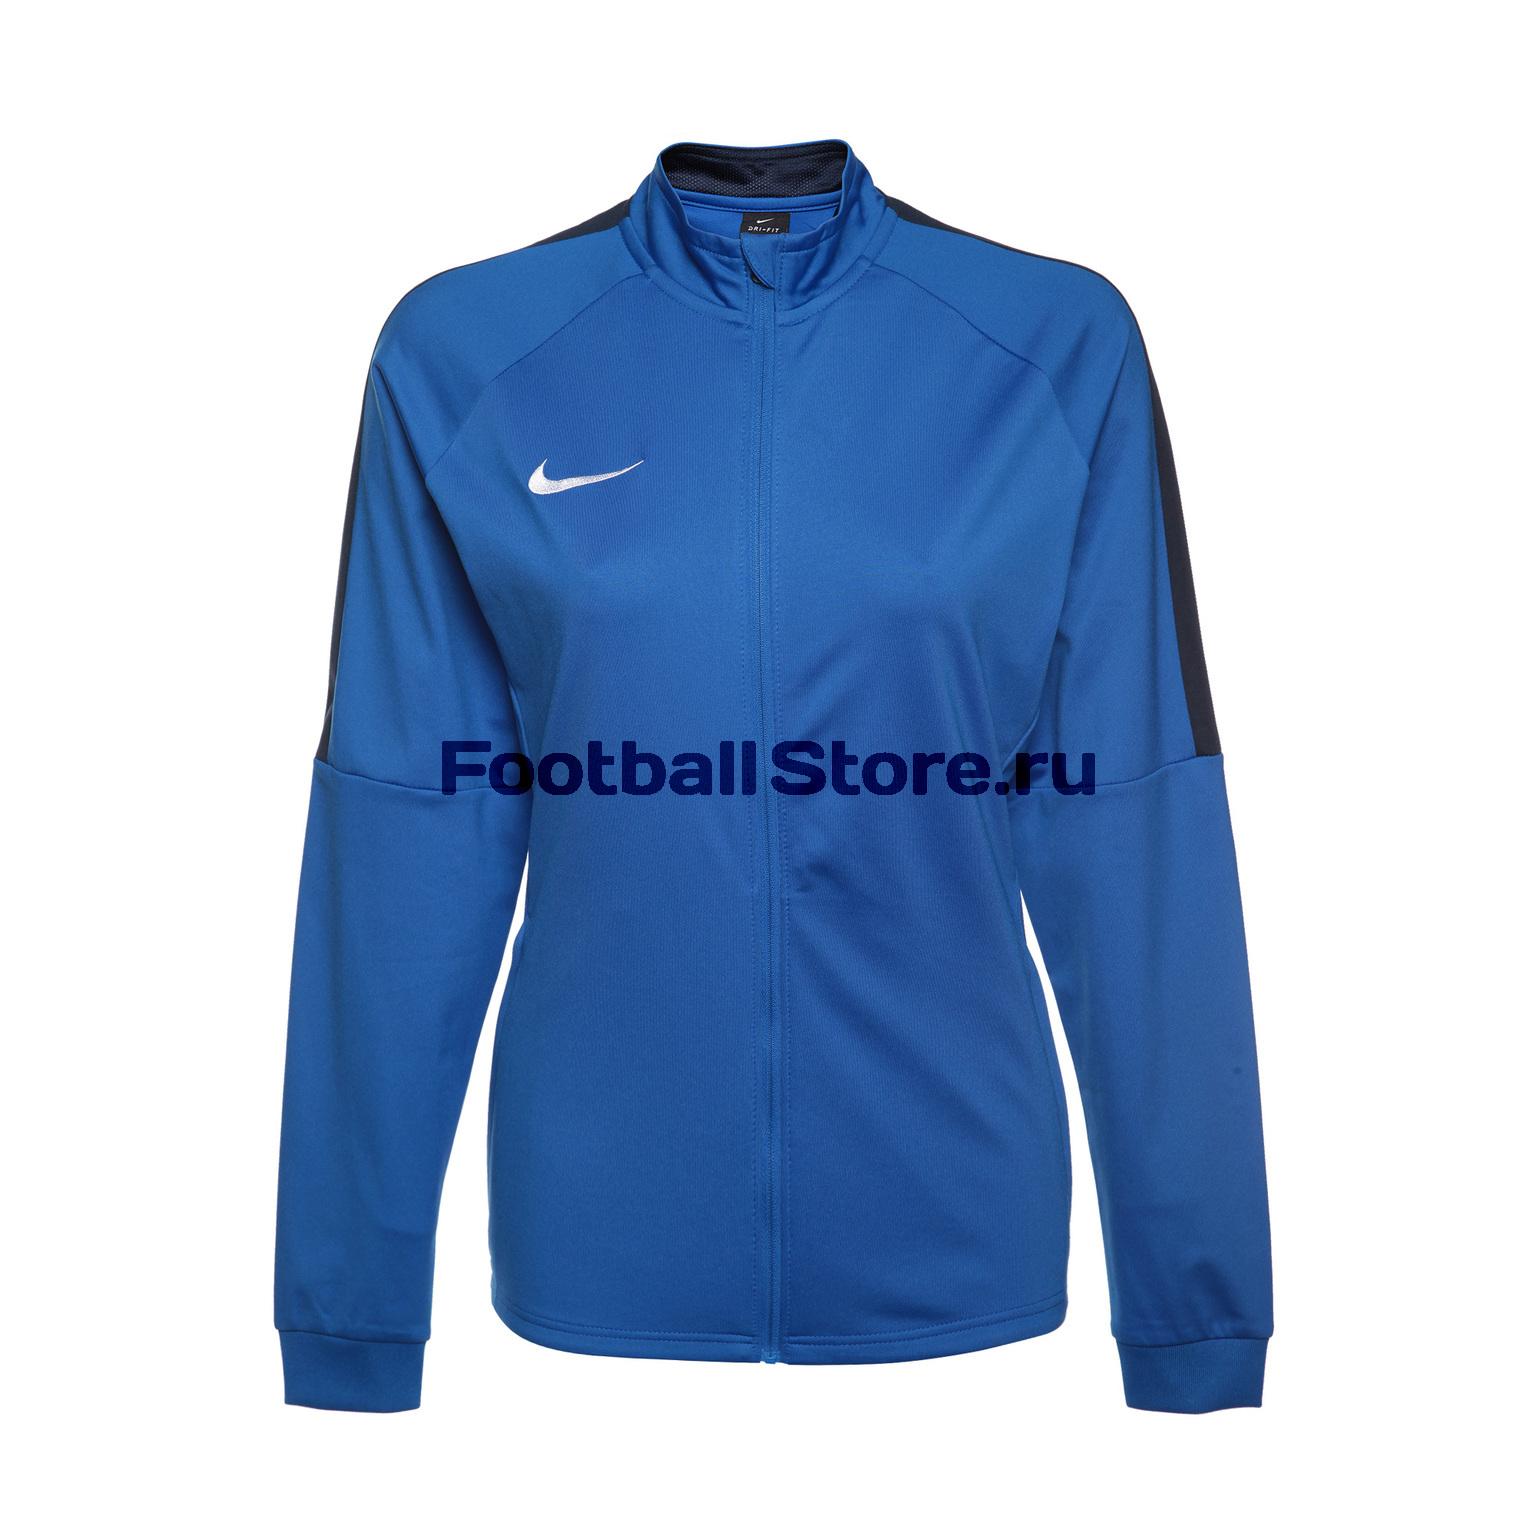 772a953e Куртка для костюма женская Nike Dry Academy18 893767-463 цена и фото